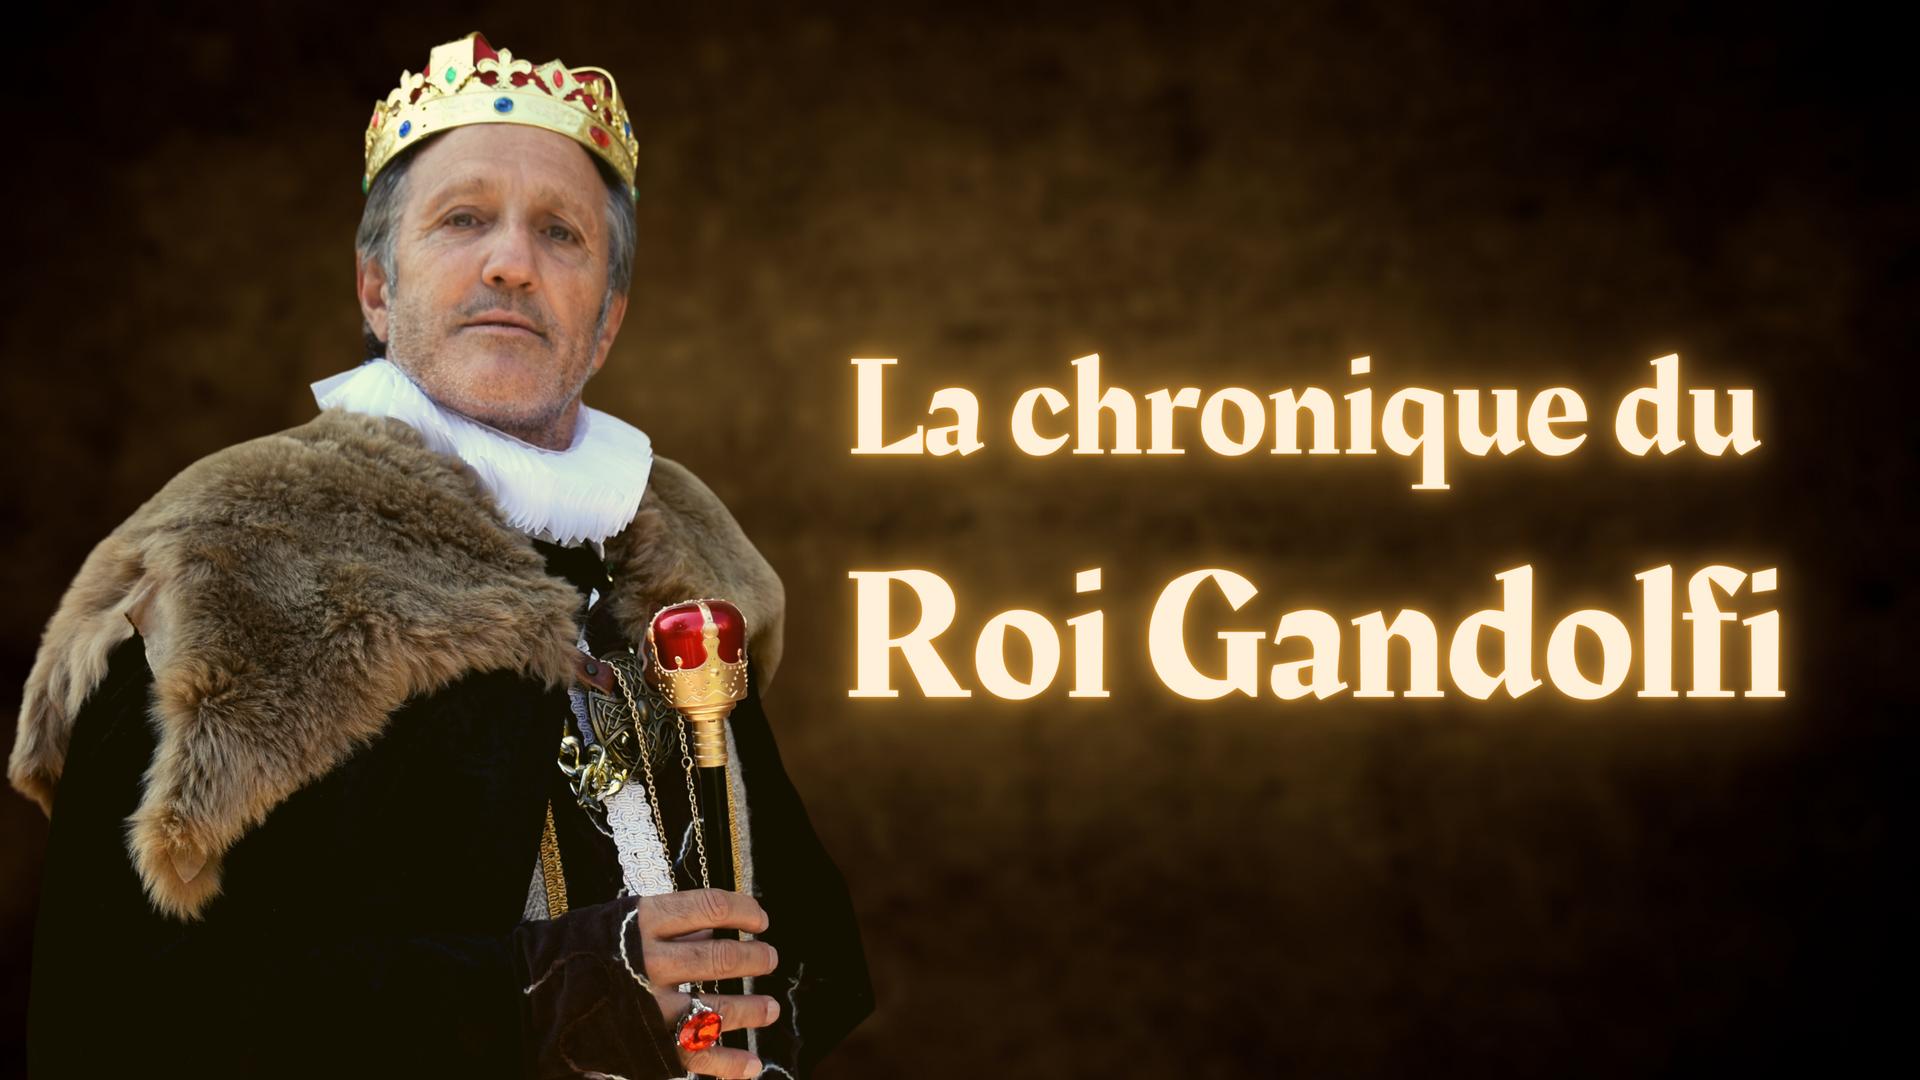 LA CHRONIQUE DU ROI GANDOLFI